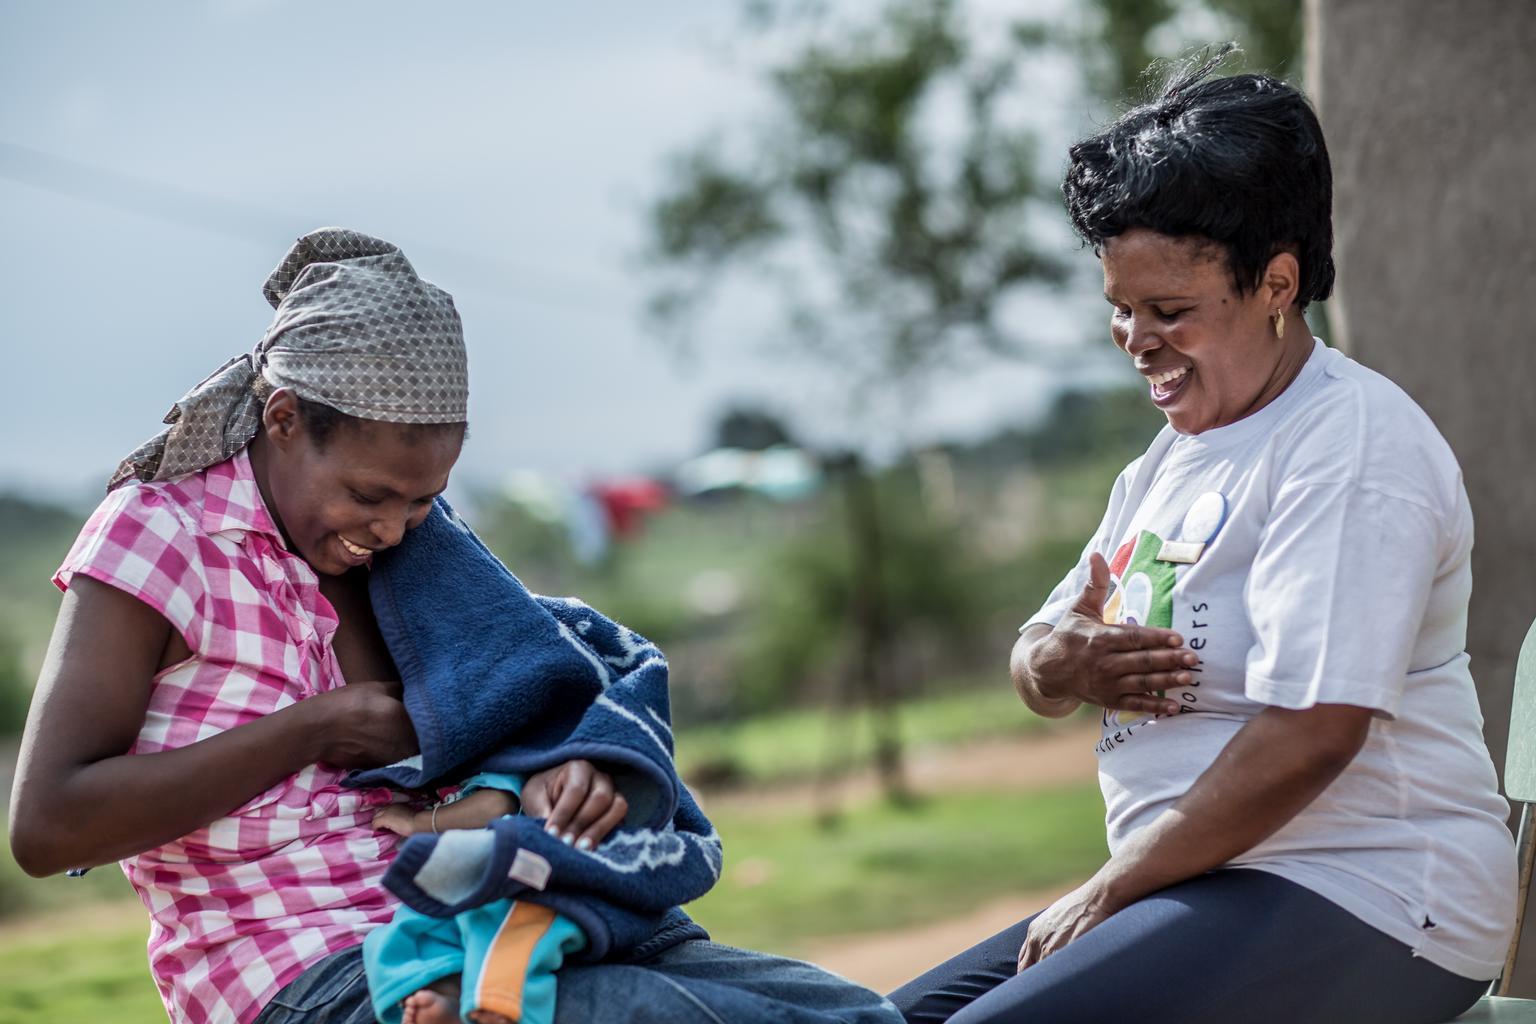 © UNICEF/PFPG2014P-0415/Karin Schermbrucker